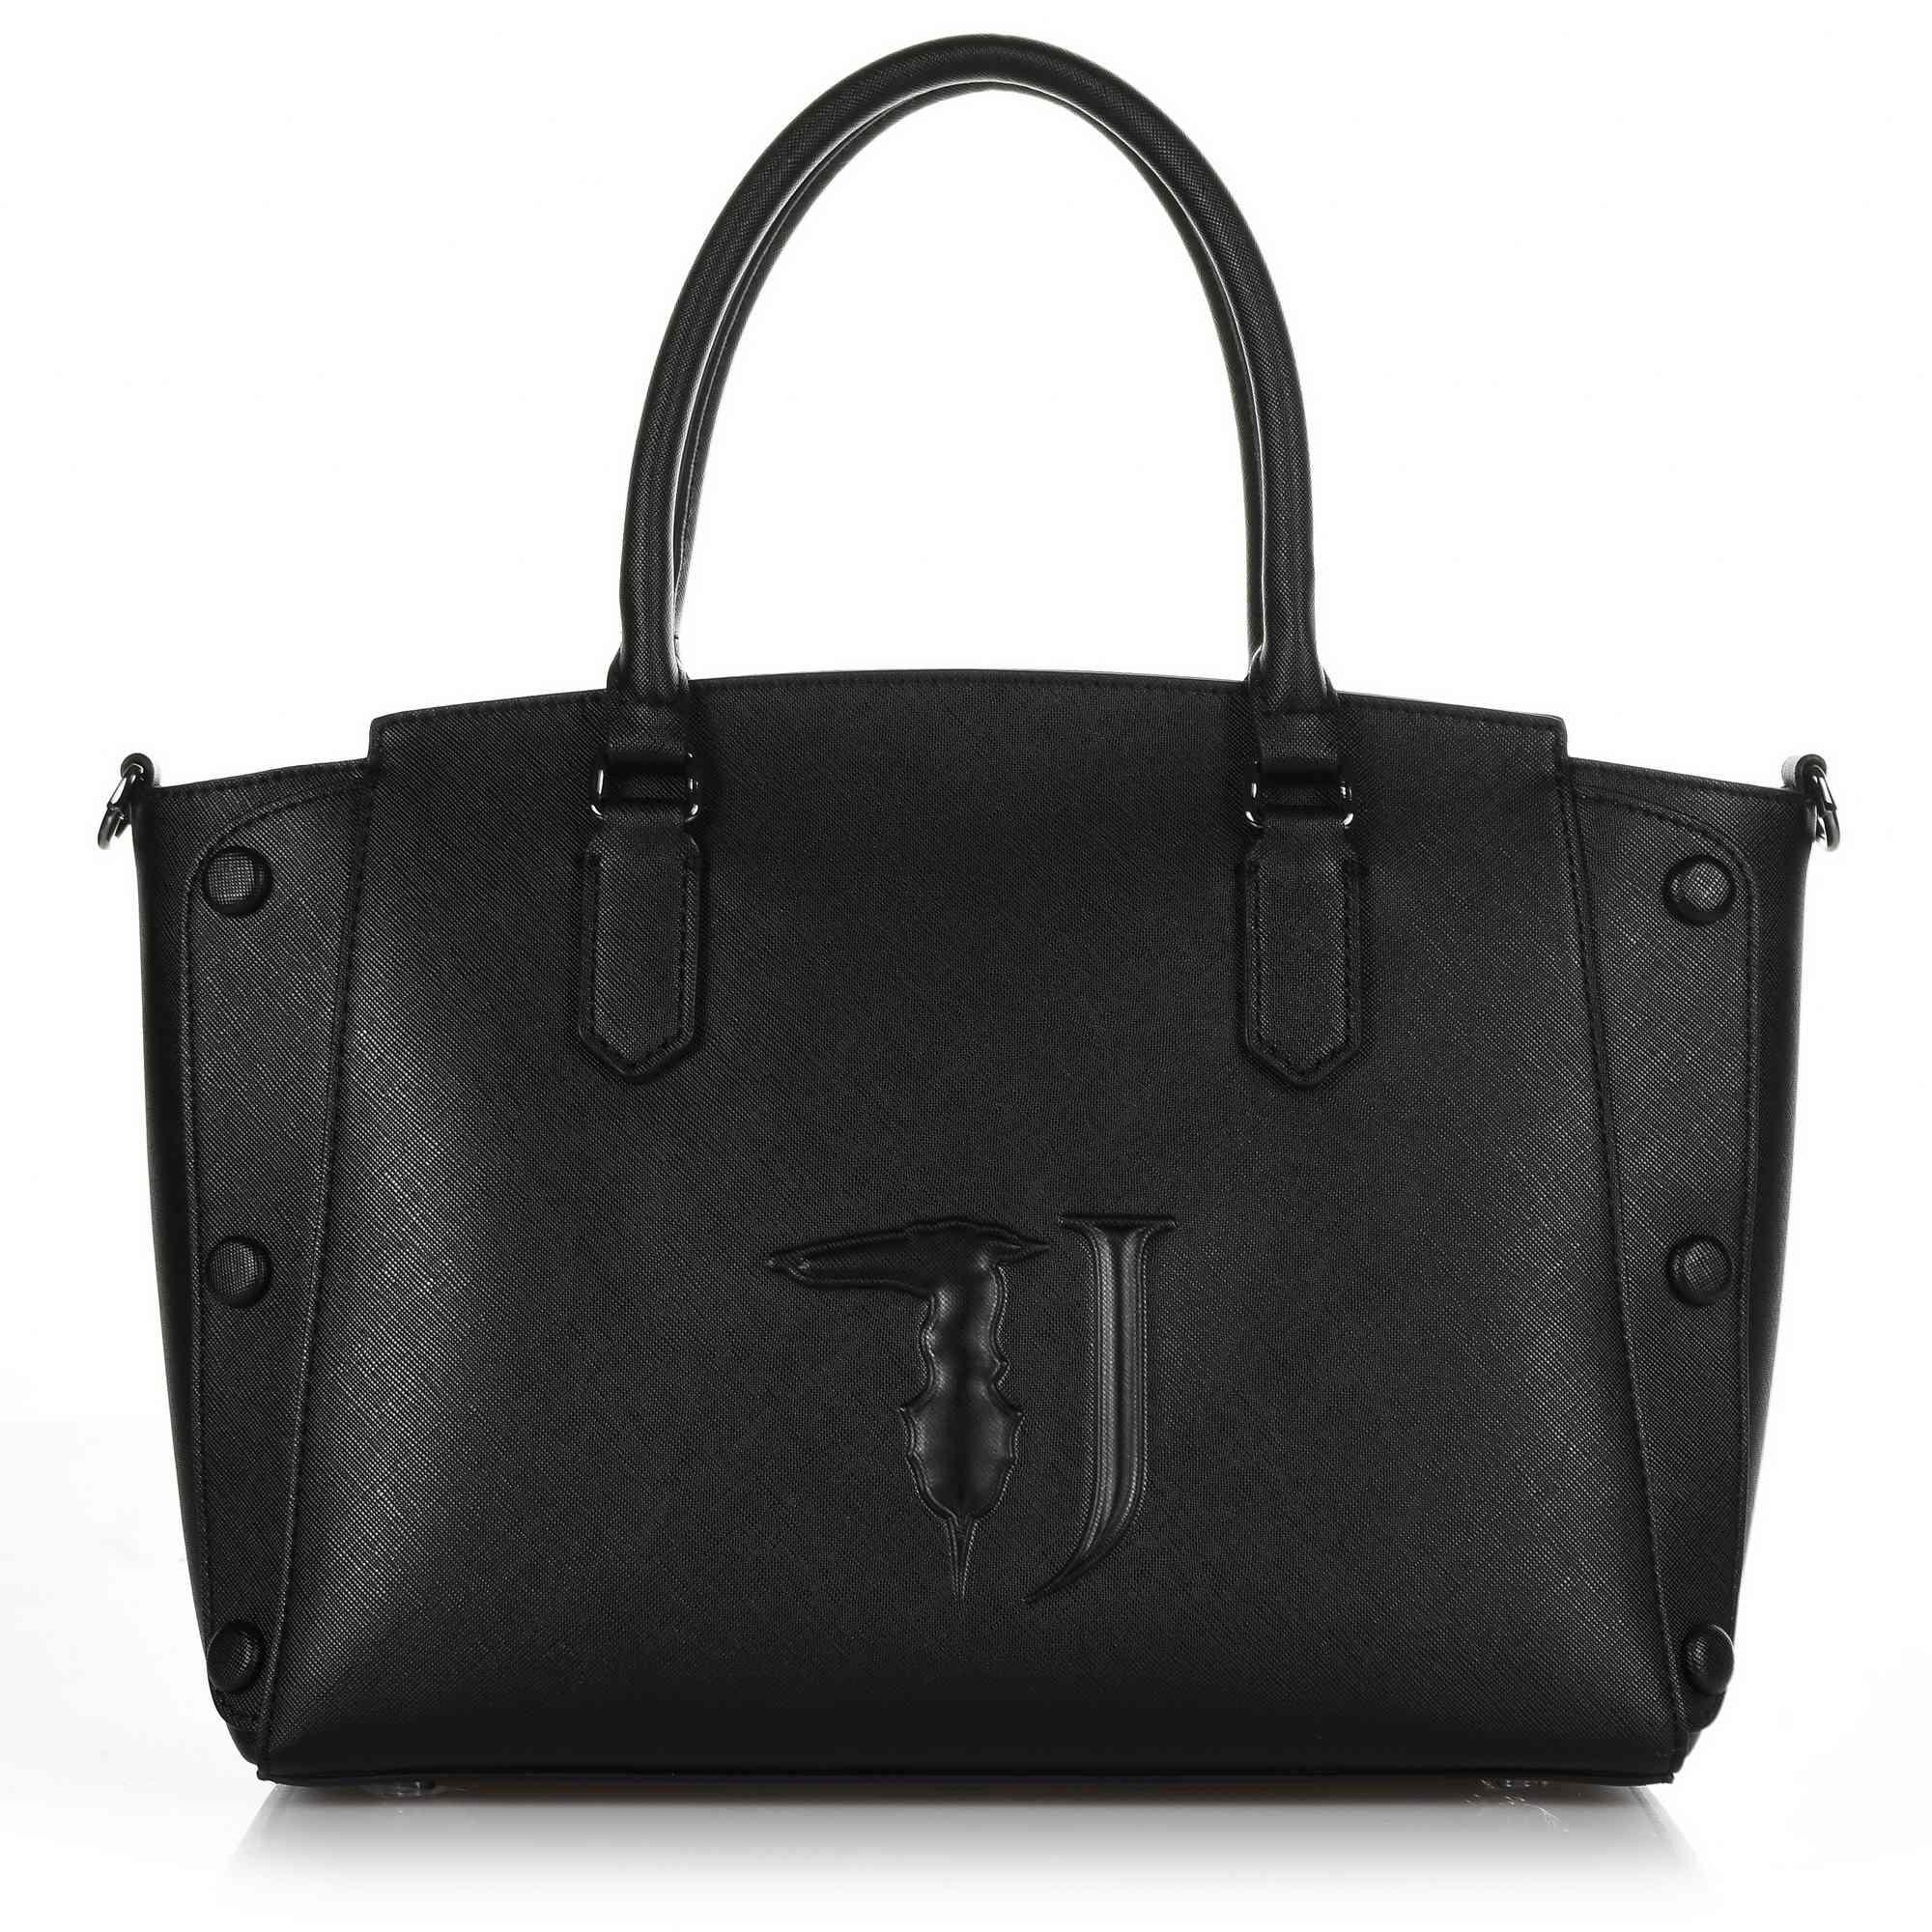 Tote Τσάντα Ώμου-Χιαστί Trussardi Jeans Melissa Tote Medium Bag Ecoleather Covered Studs 75B00454